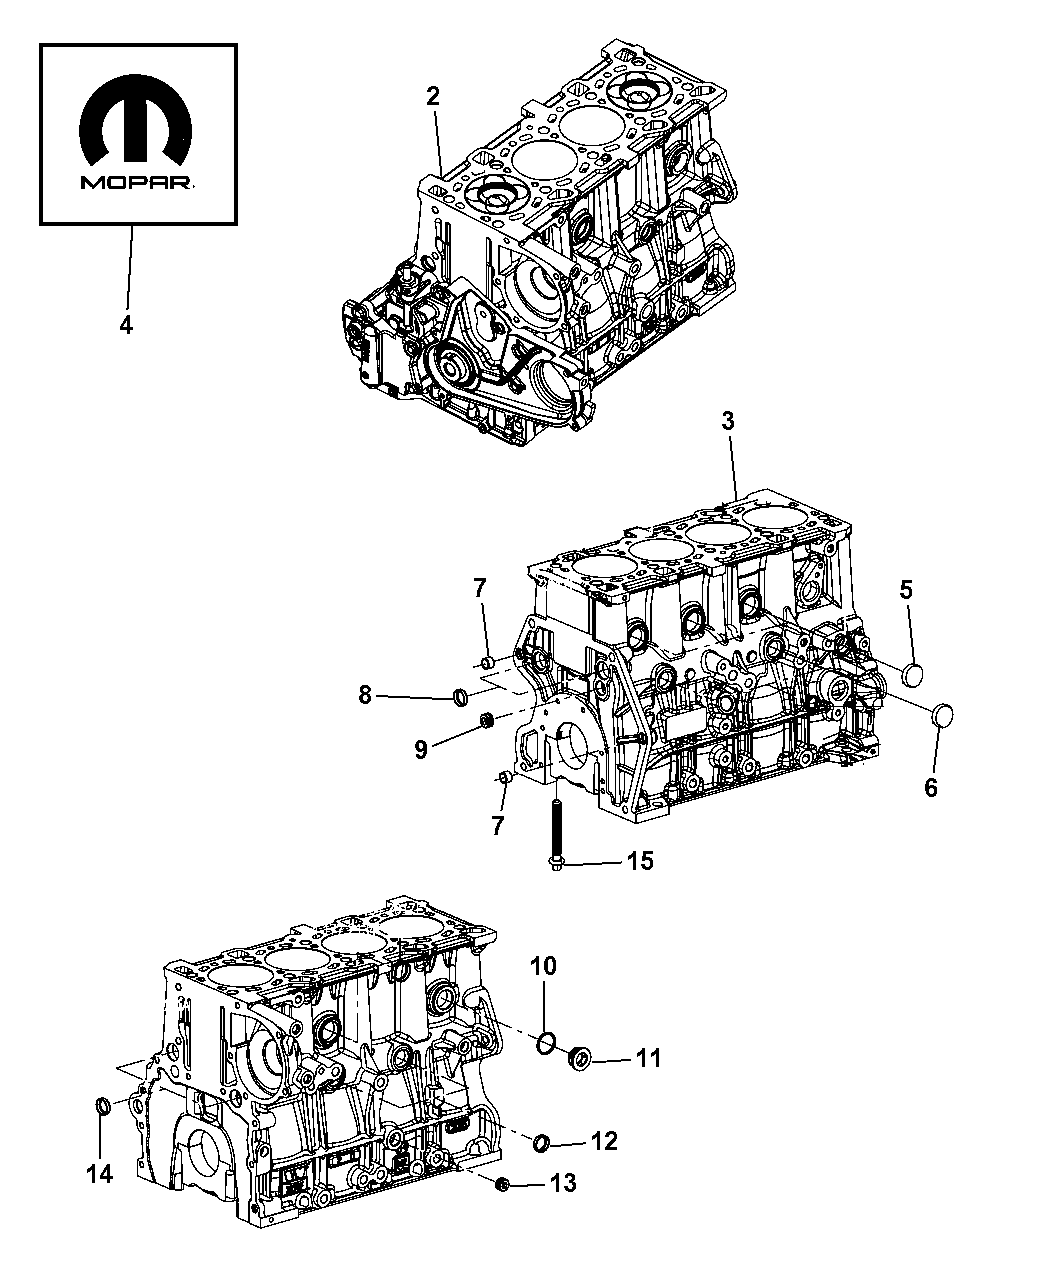 2008 jeep liberty engine diagram